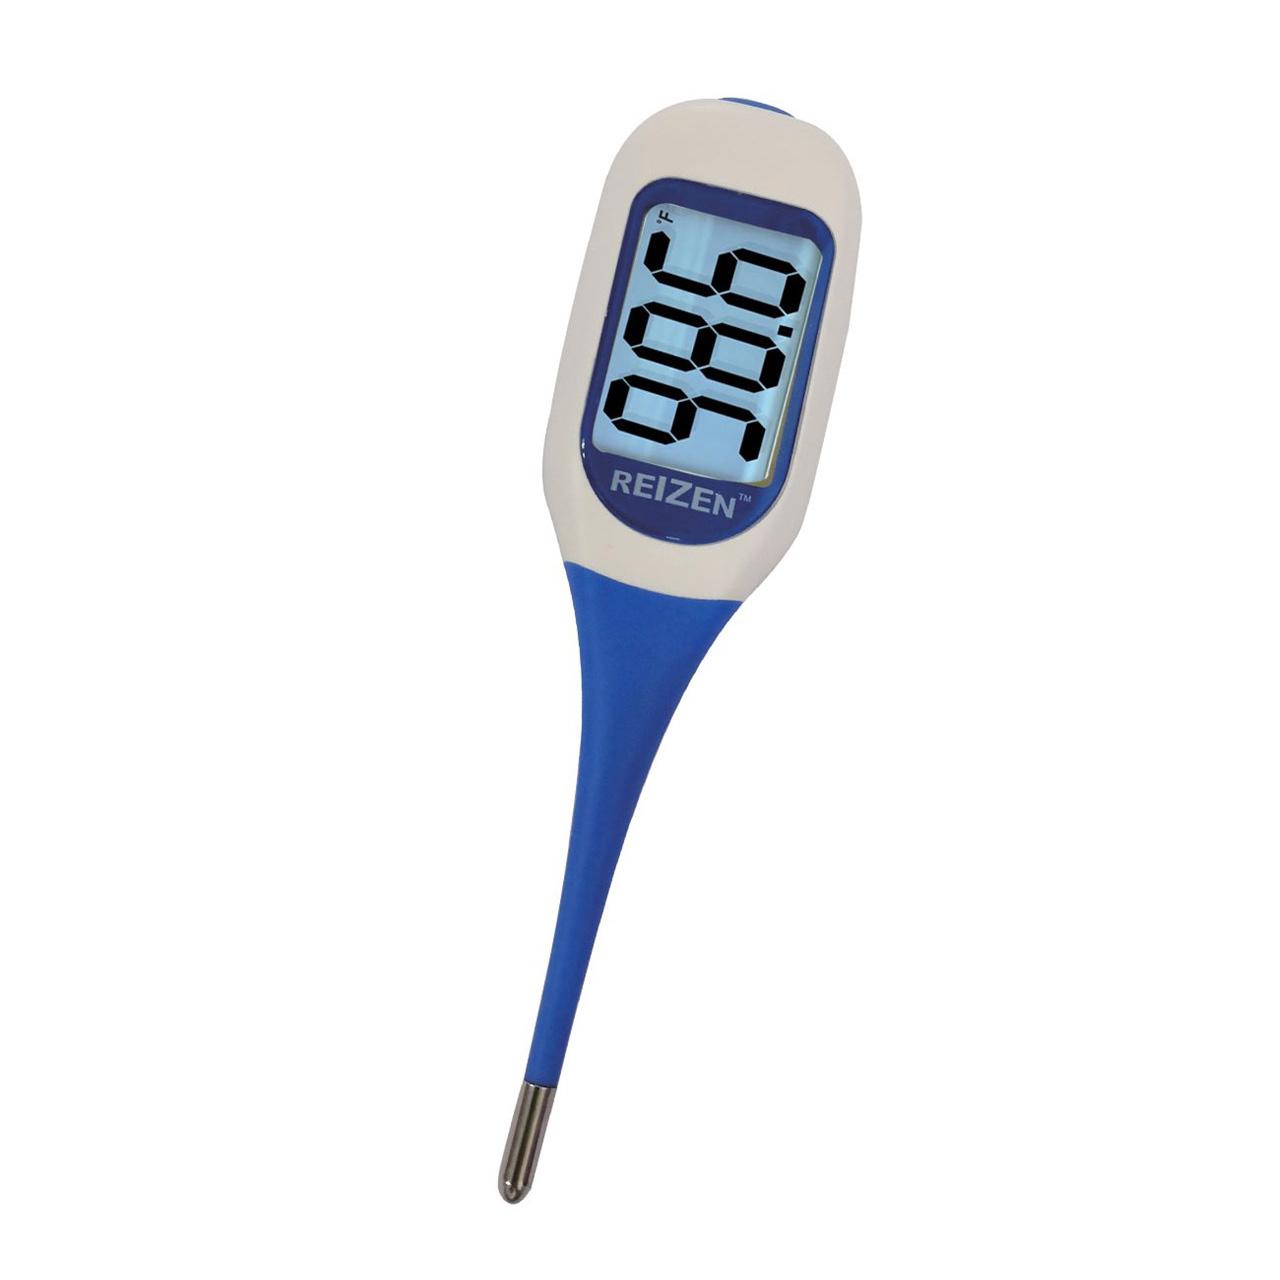 Reizen Talking Digital Thermometer